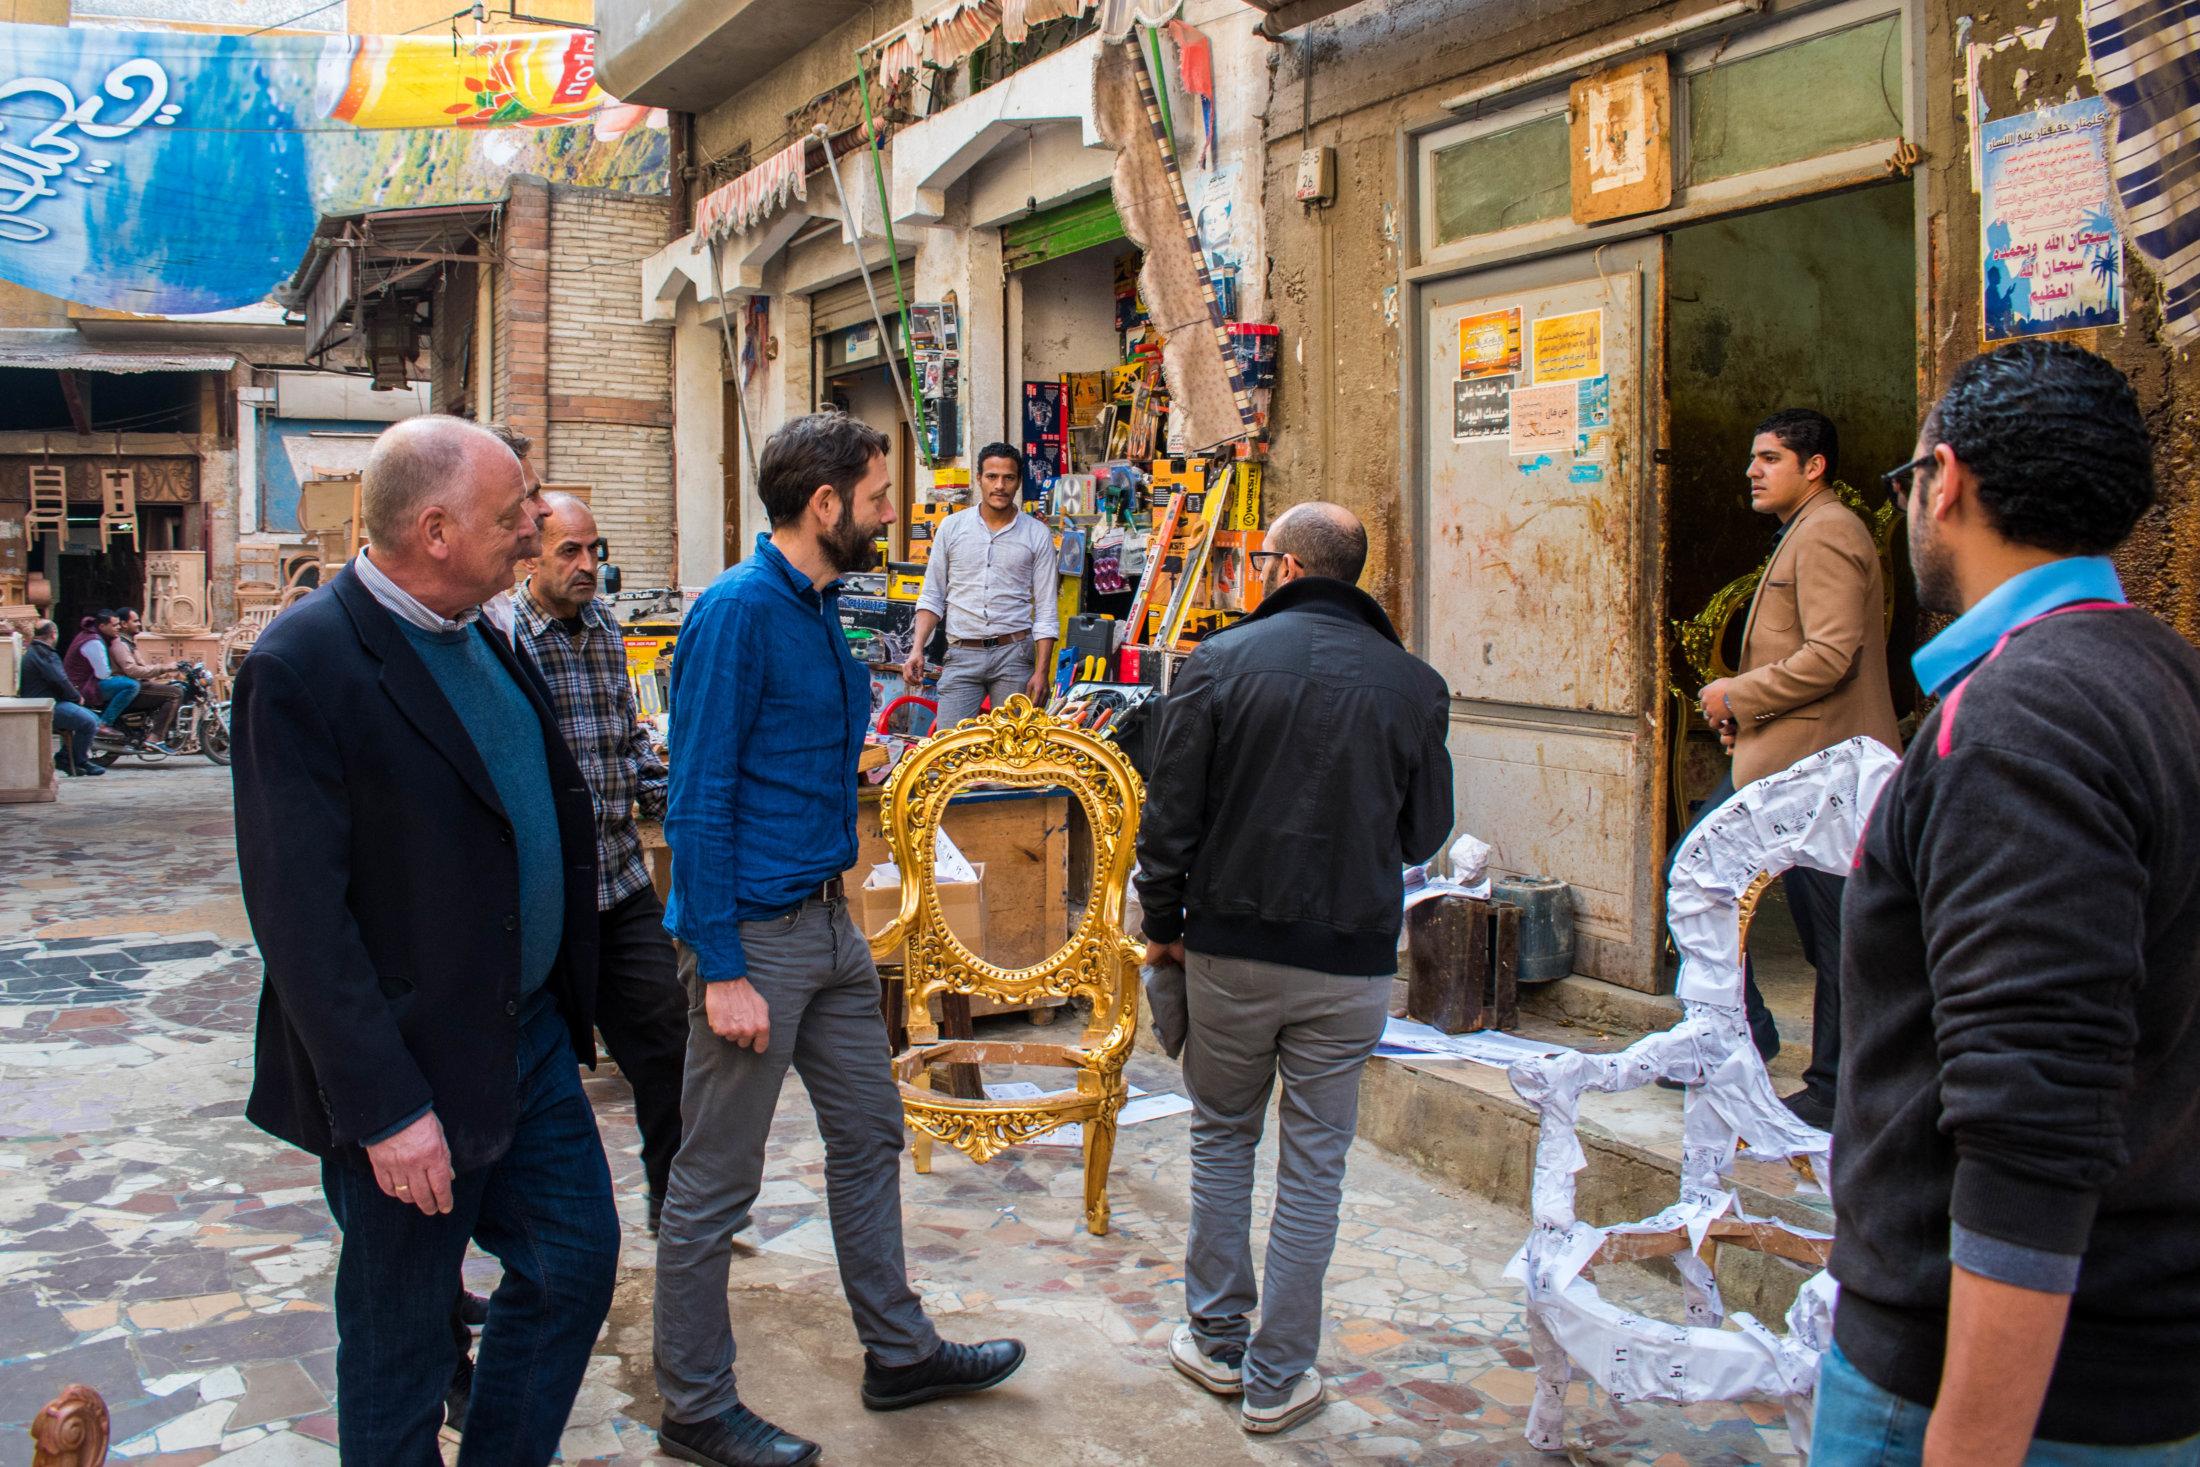 Visiting the traditional suq of Damietta where furniture is produced – Suq Abdel Rahman